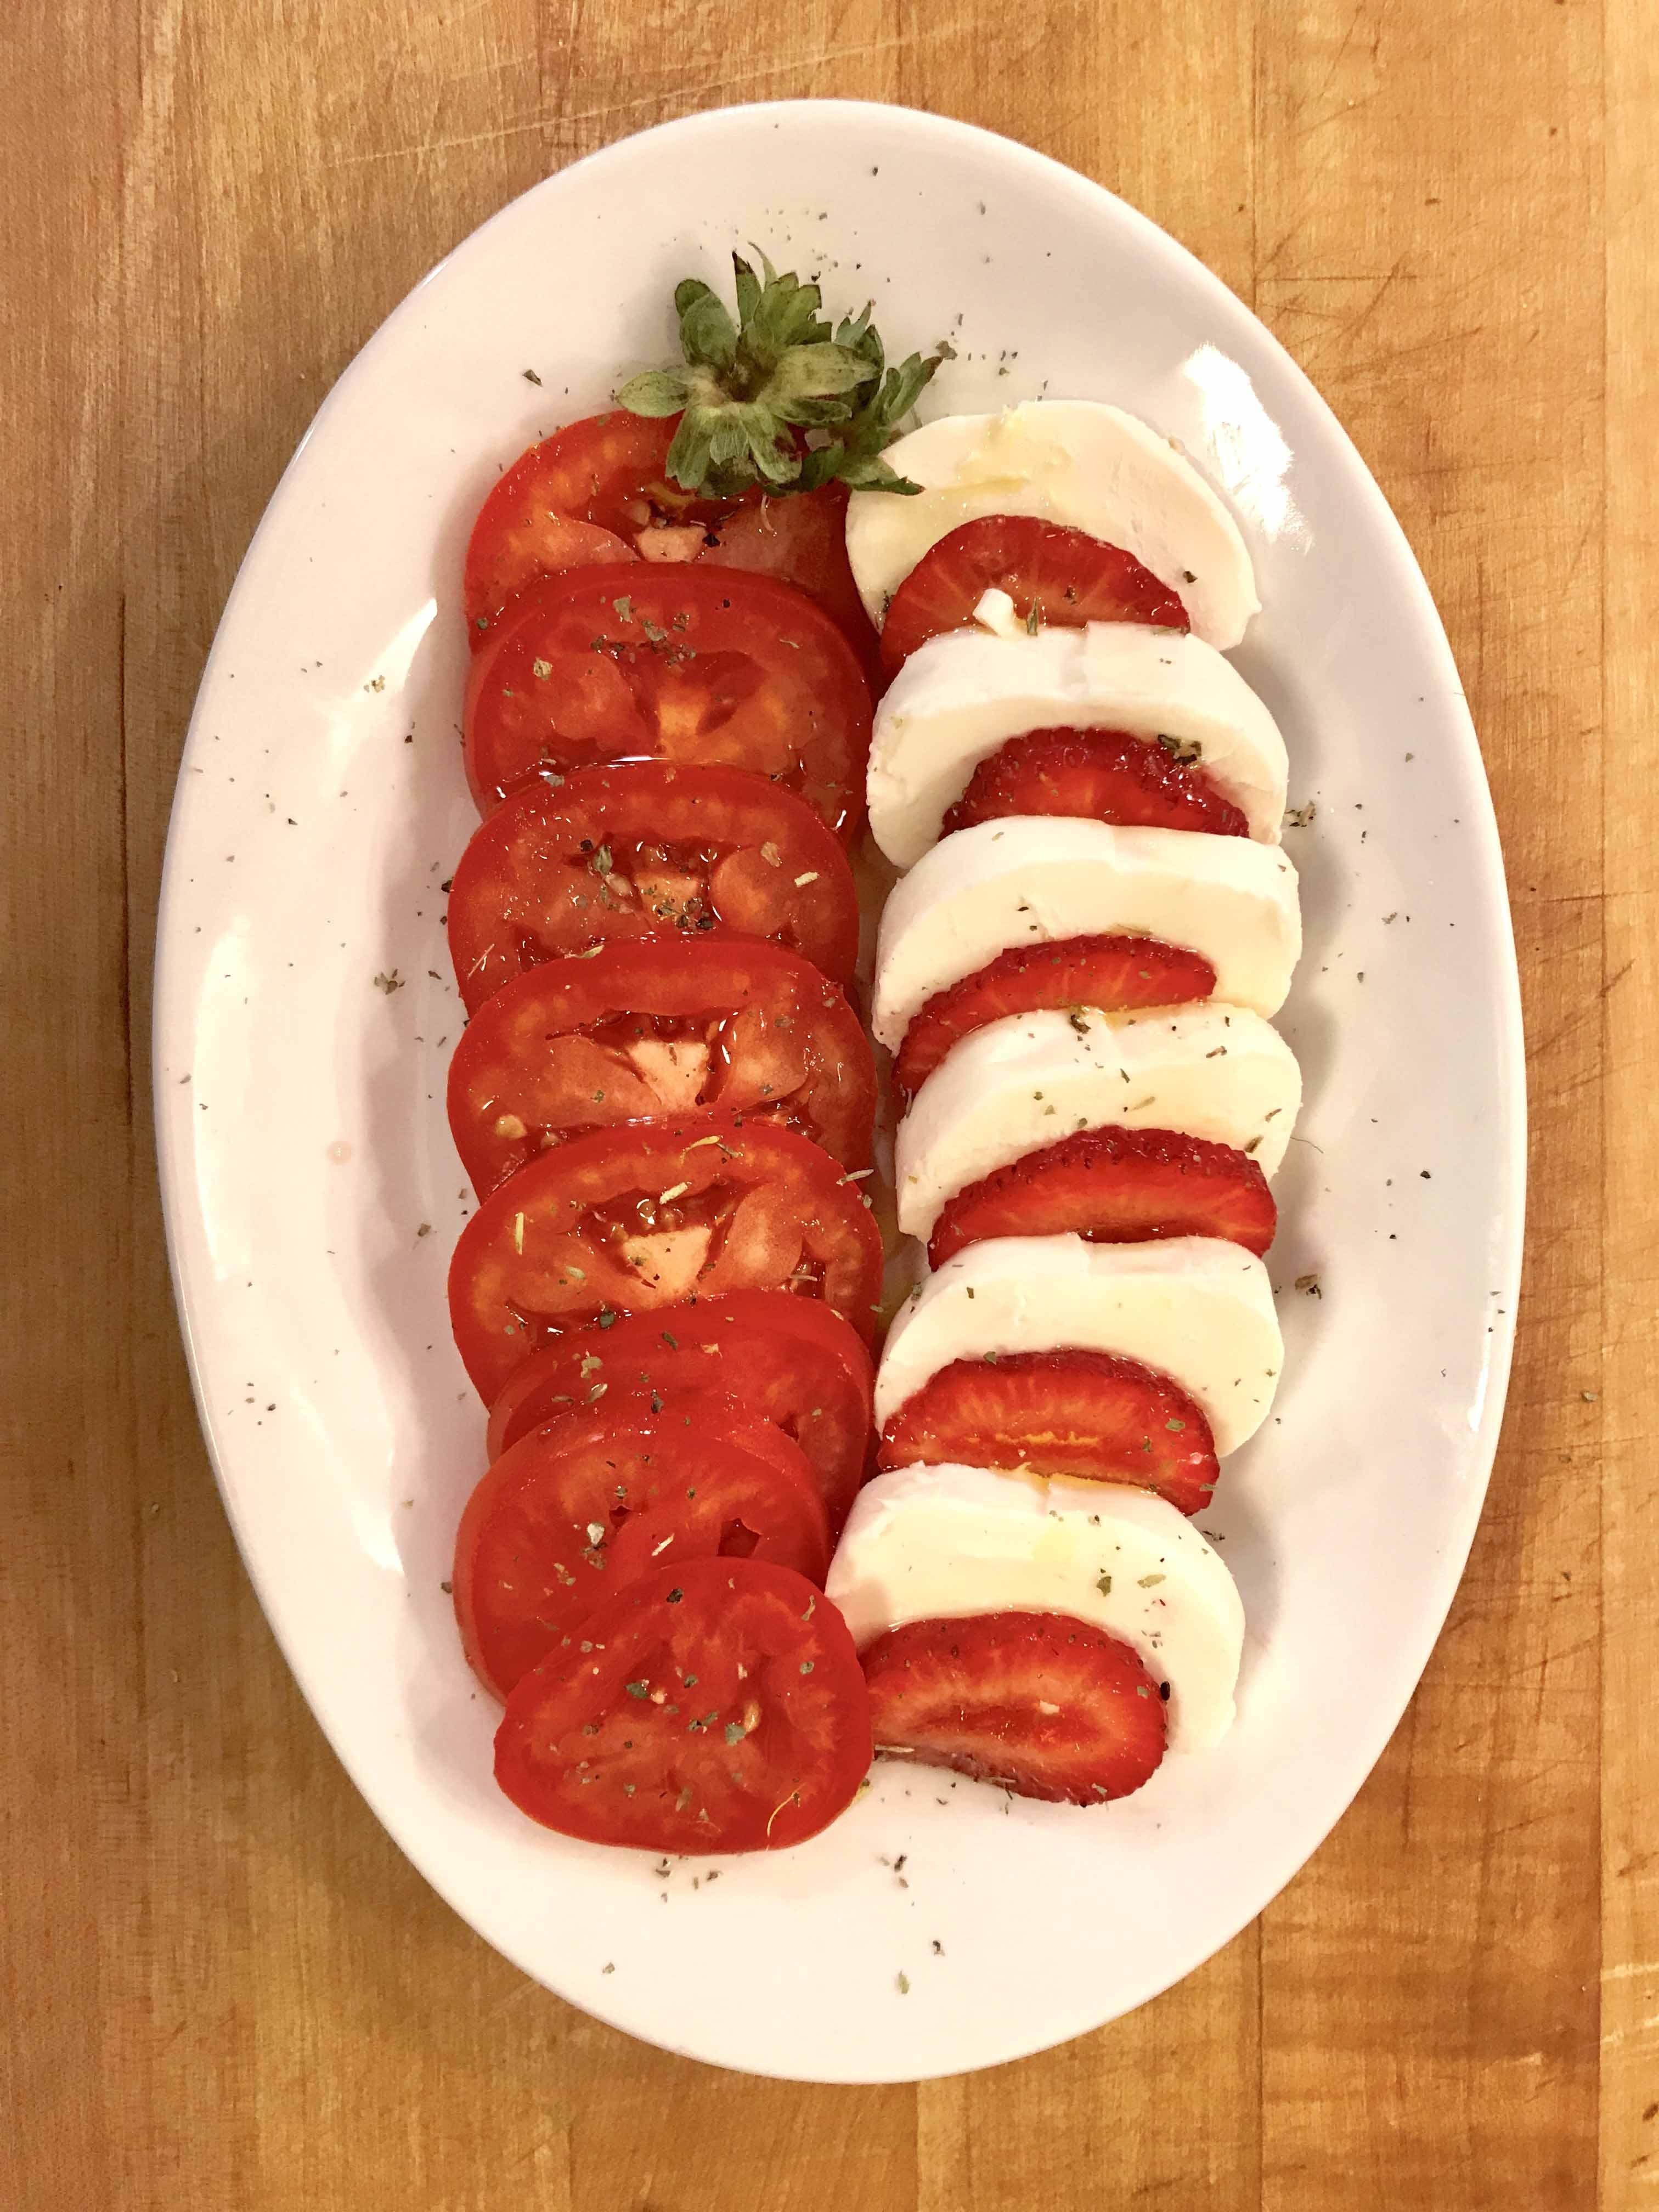 Strawberry-Tomato Caprese Salad